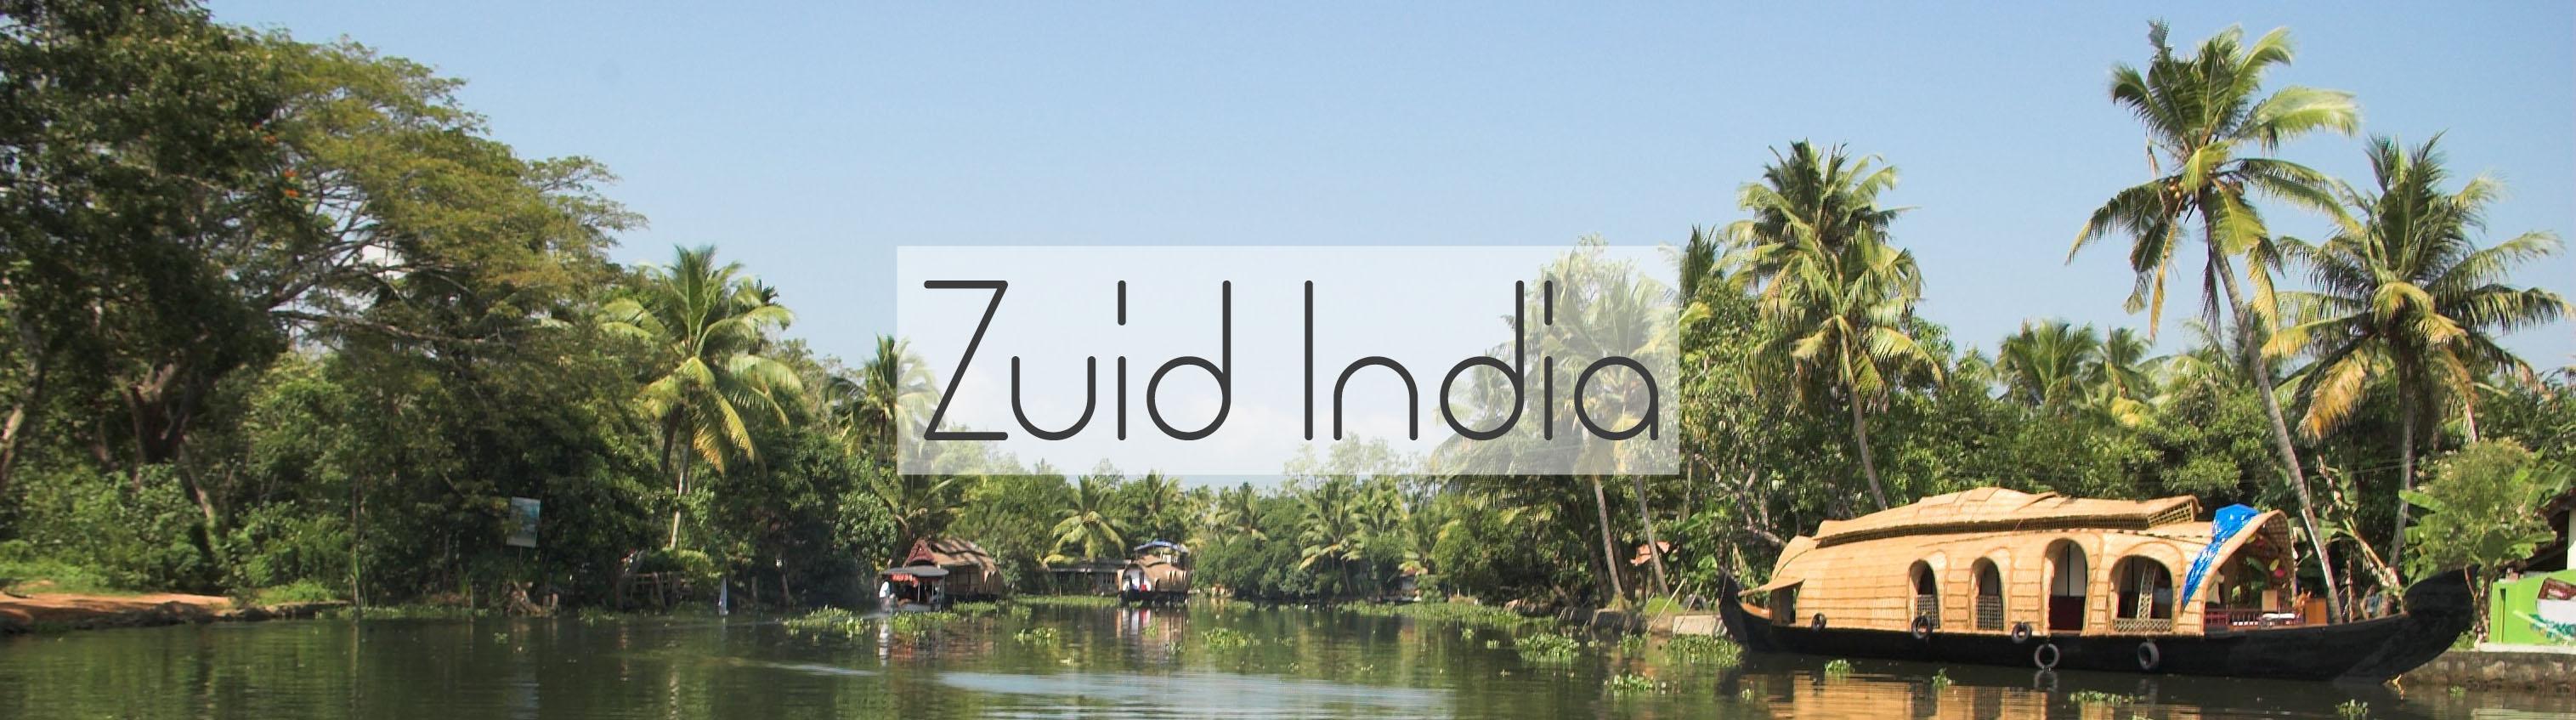 zuid-india reisinfo